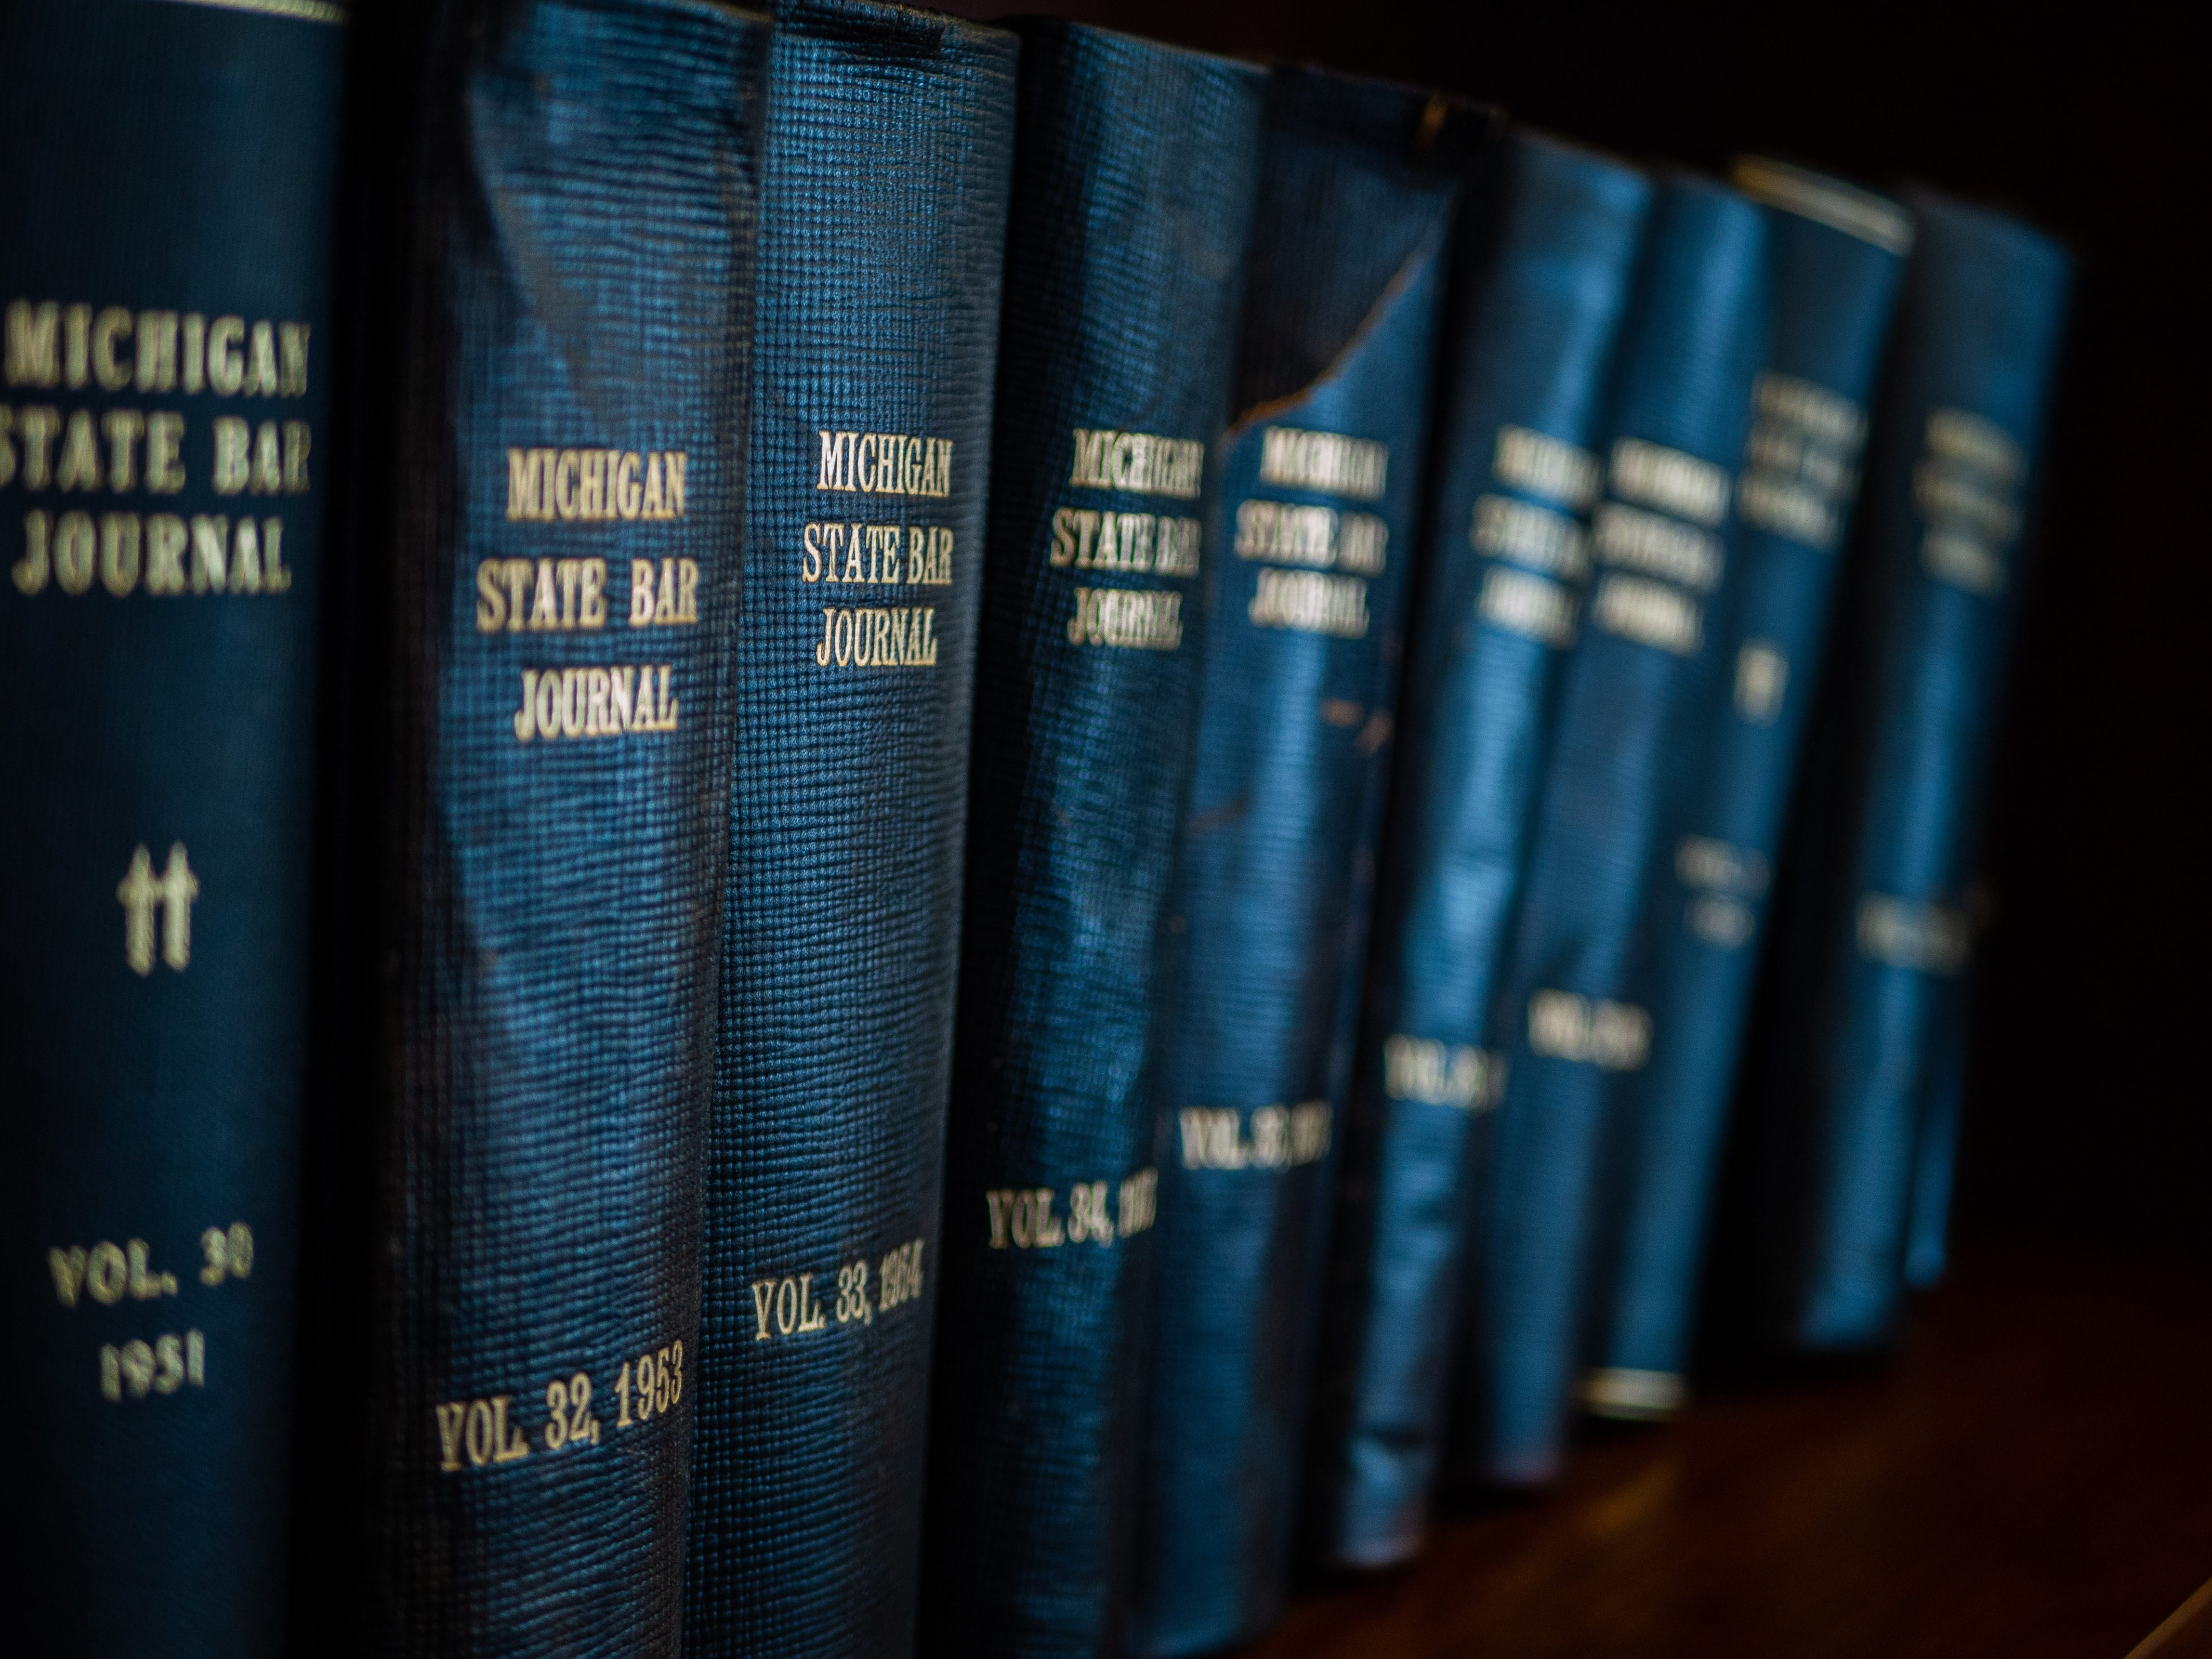 Michigan State Law Journals on bookshelf; image by Rob Girkin, via unsplash.com.